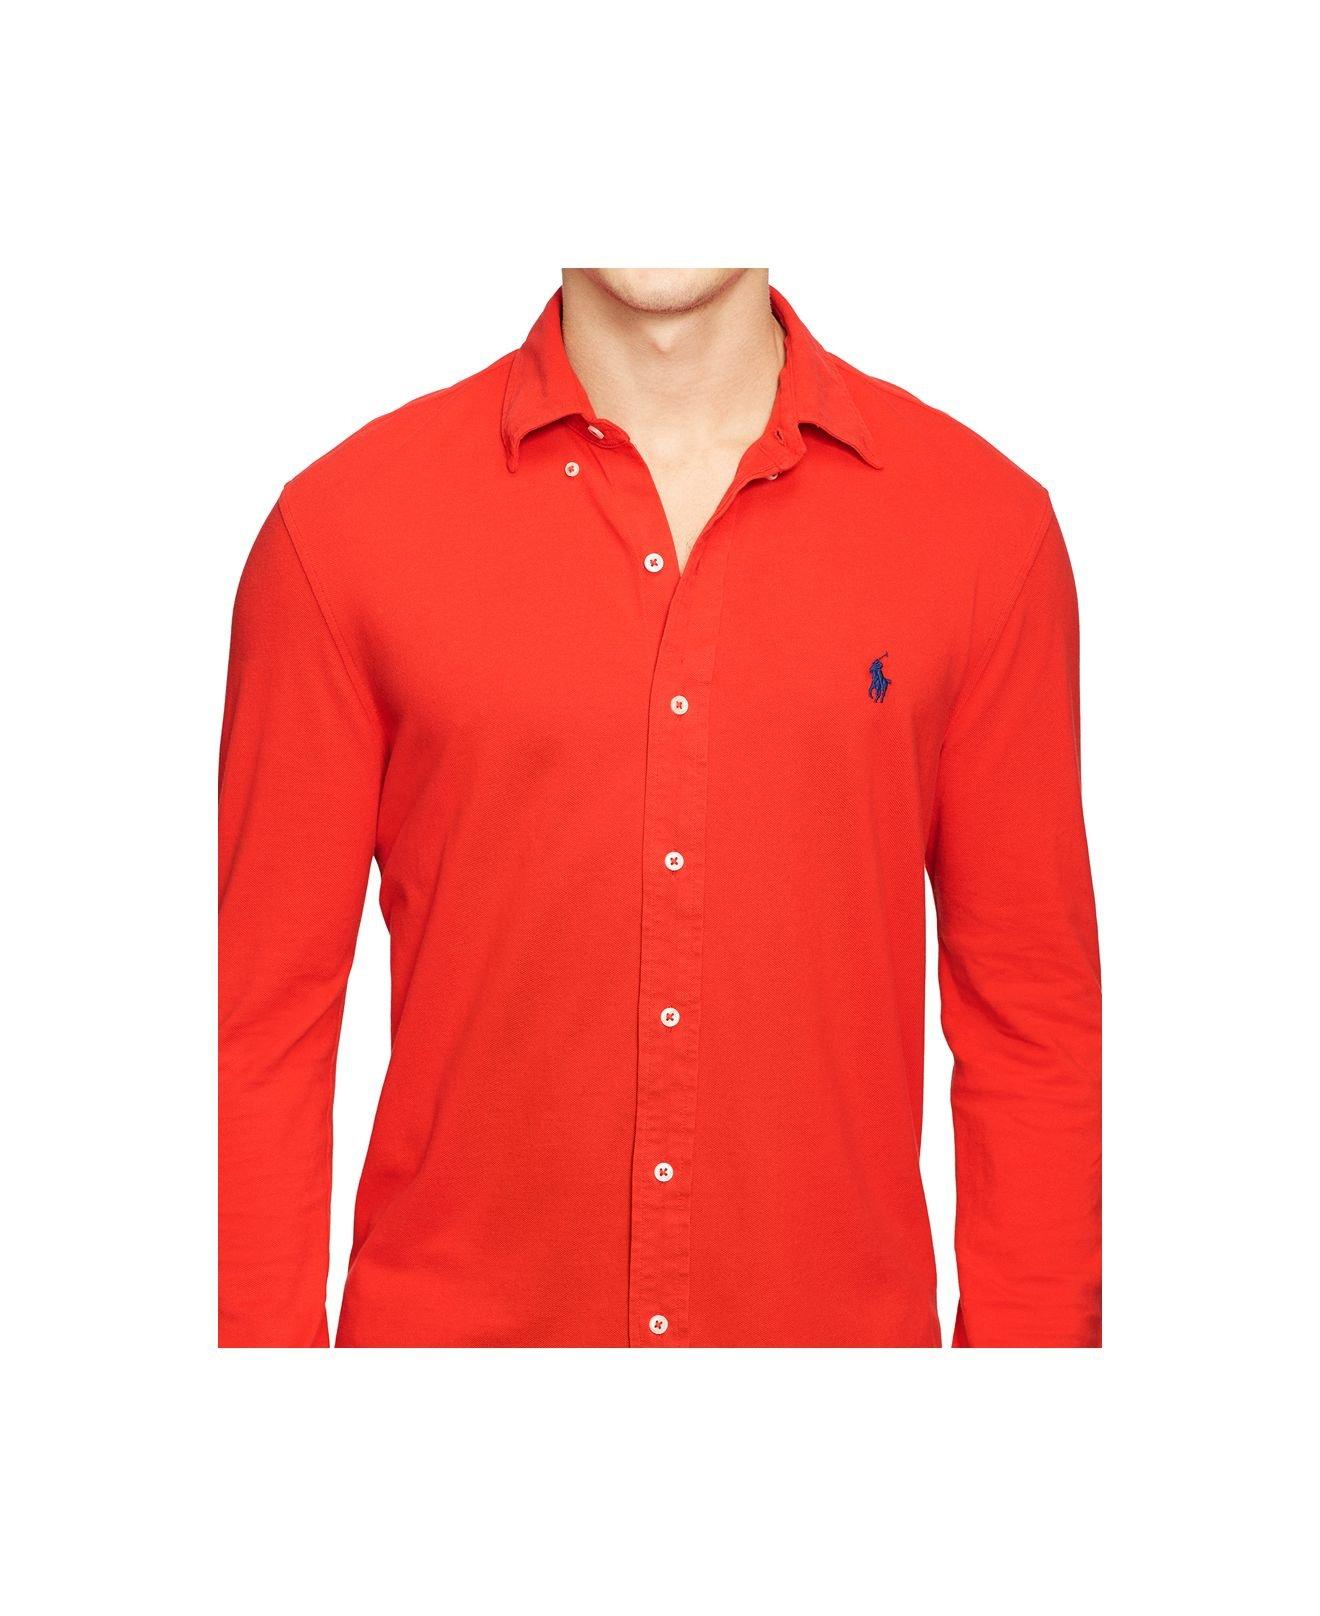 Lyst polo ralph lauren featherweight mesh button down for Polo ralph lauren casual button down shirts